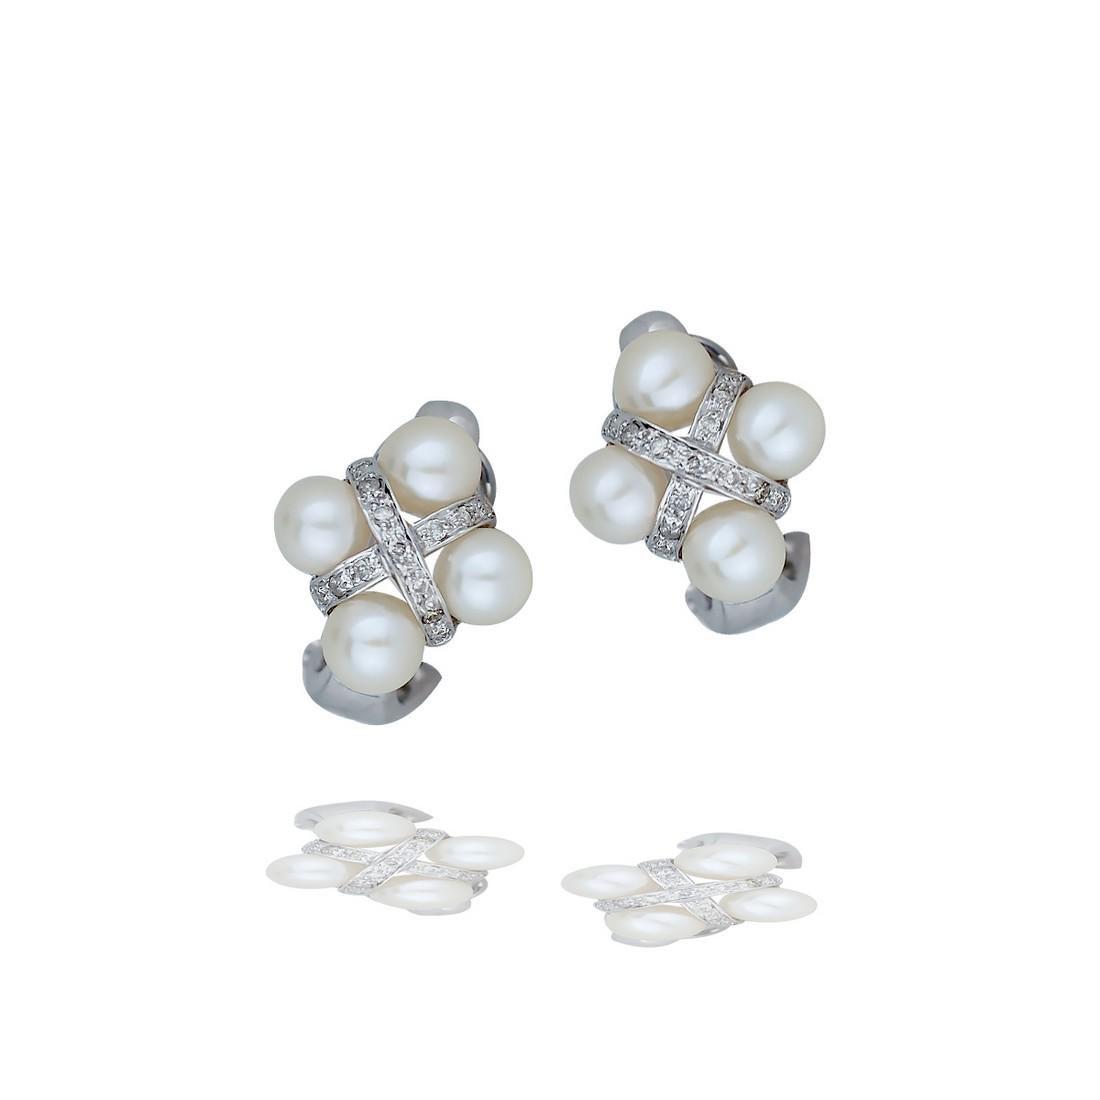 Vintage, Diamond and Pearl Cross-Cross, Omega Earrings,